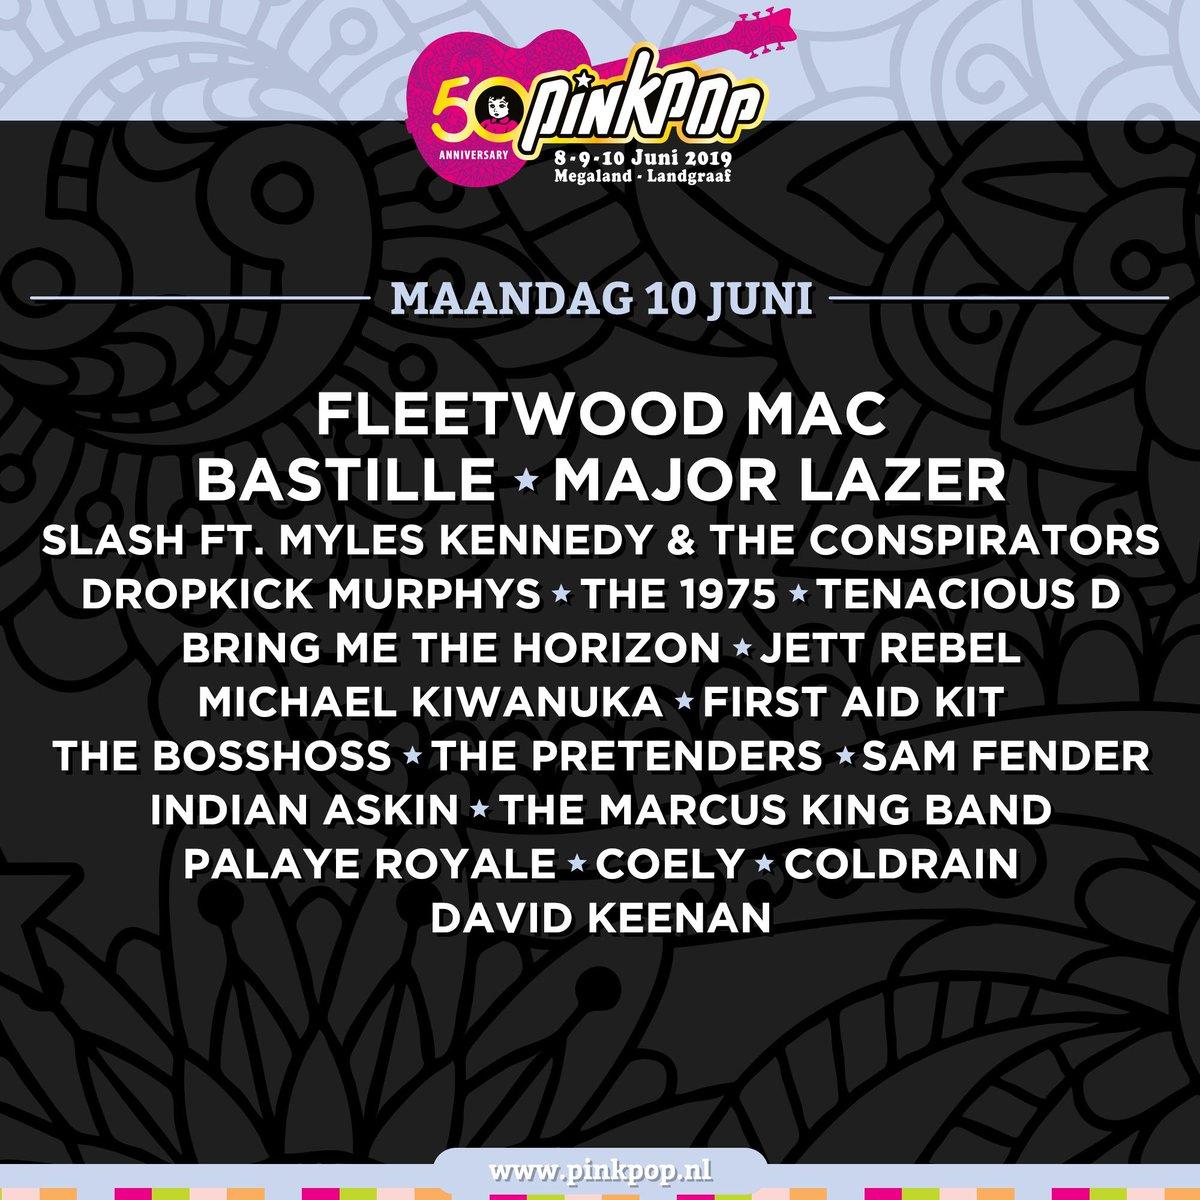 Mad Cool Festival 2019. The Cure, Iggy Pop, The National, Bon Iver, Smashing Pumpkins, Robyn, Sharon Van Etten... ¡Y lo que queda! #SoundsBetterLive - Página 2 D1ijN4yWwAIkrC-